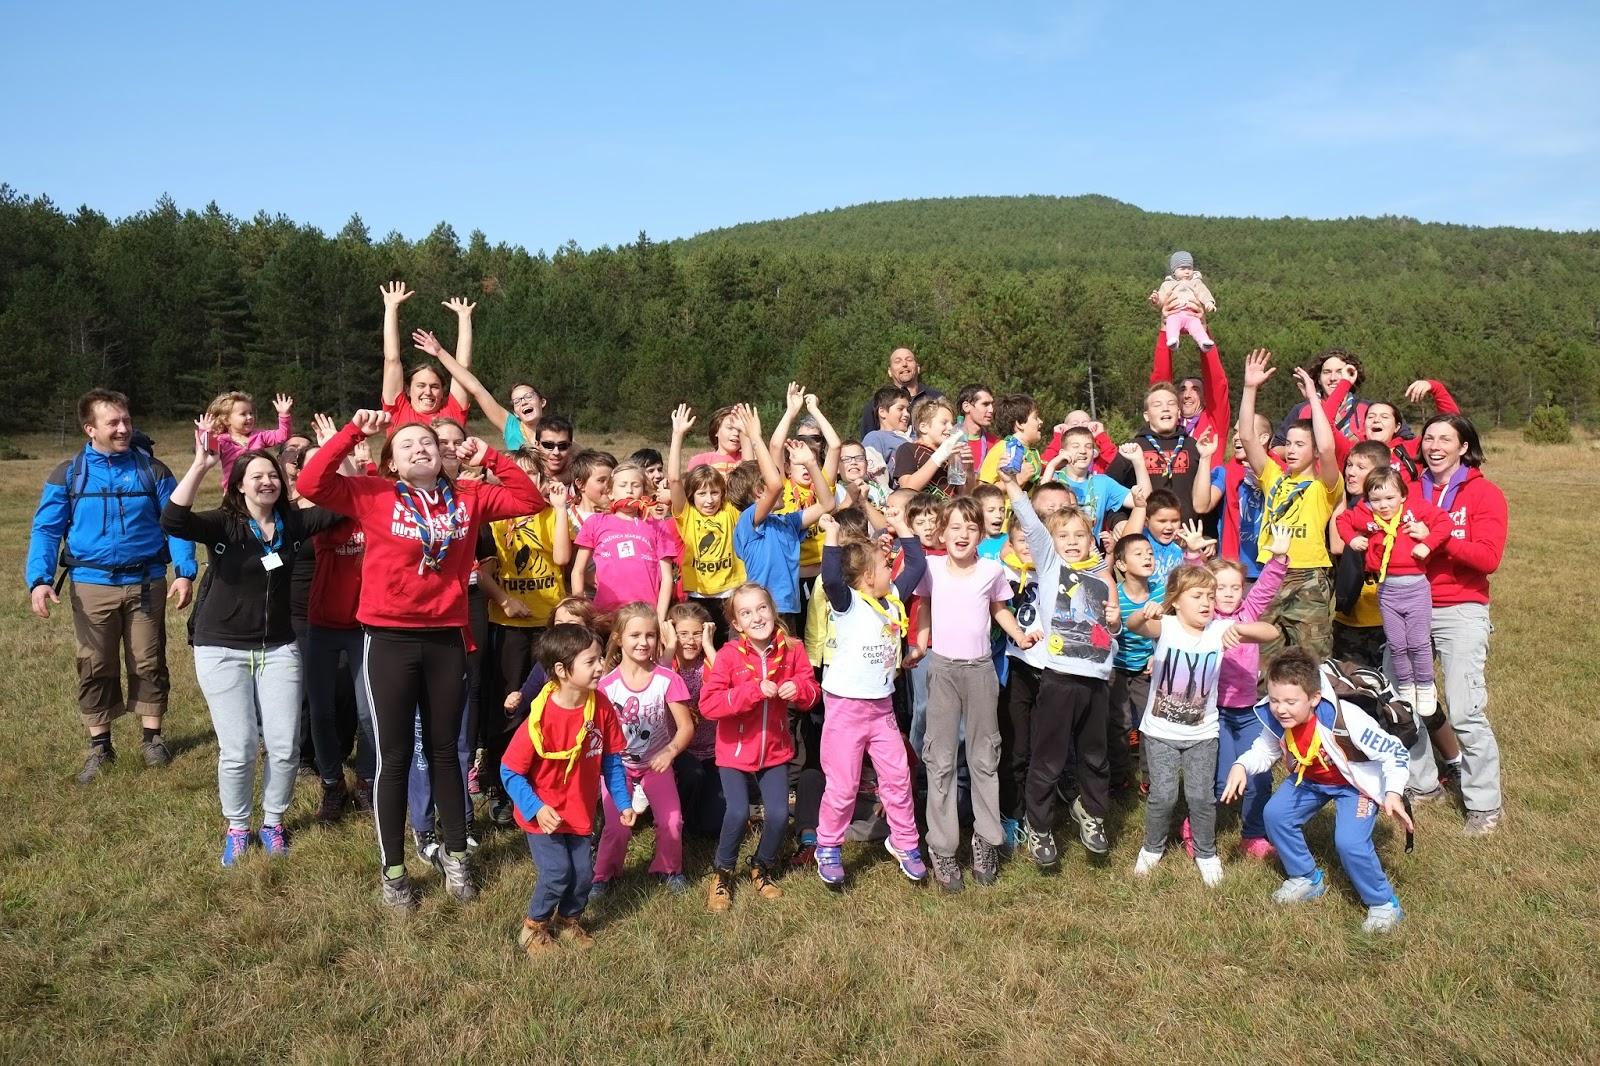 Pohod na Kozlek, Kozlek, 11.10.2014 - DSCF1233.JPG